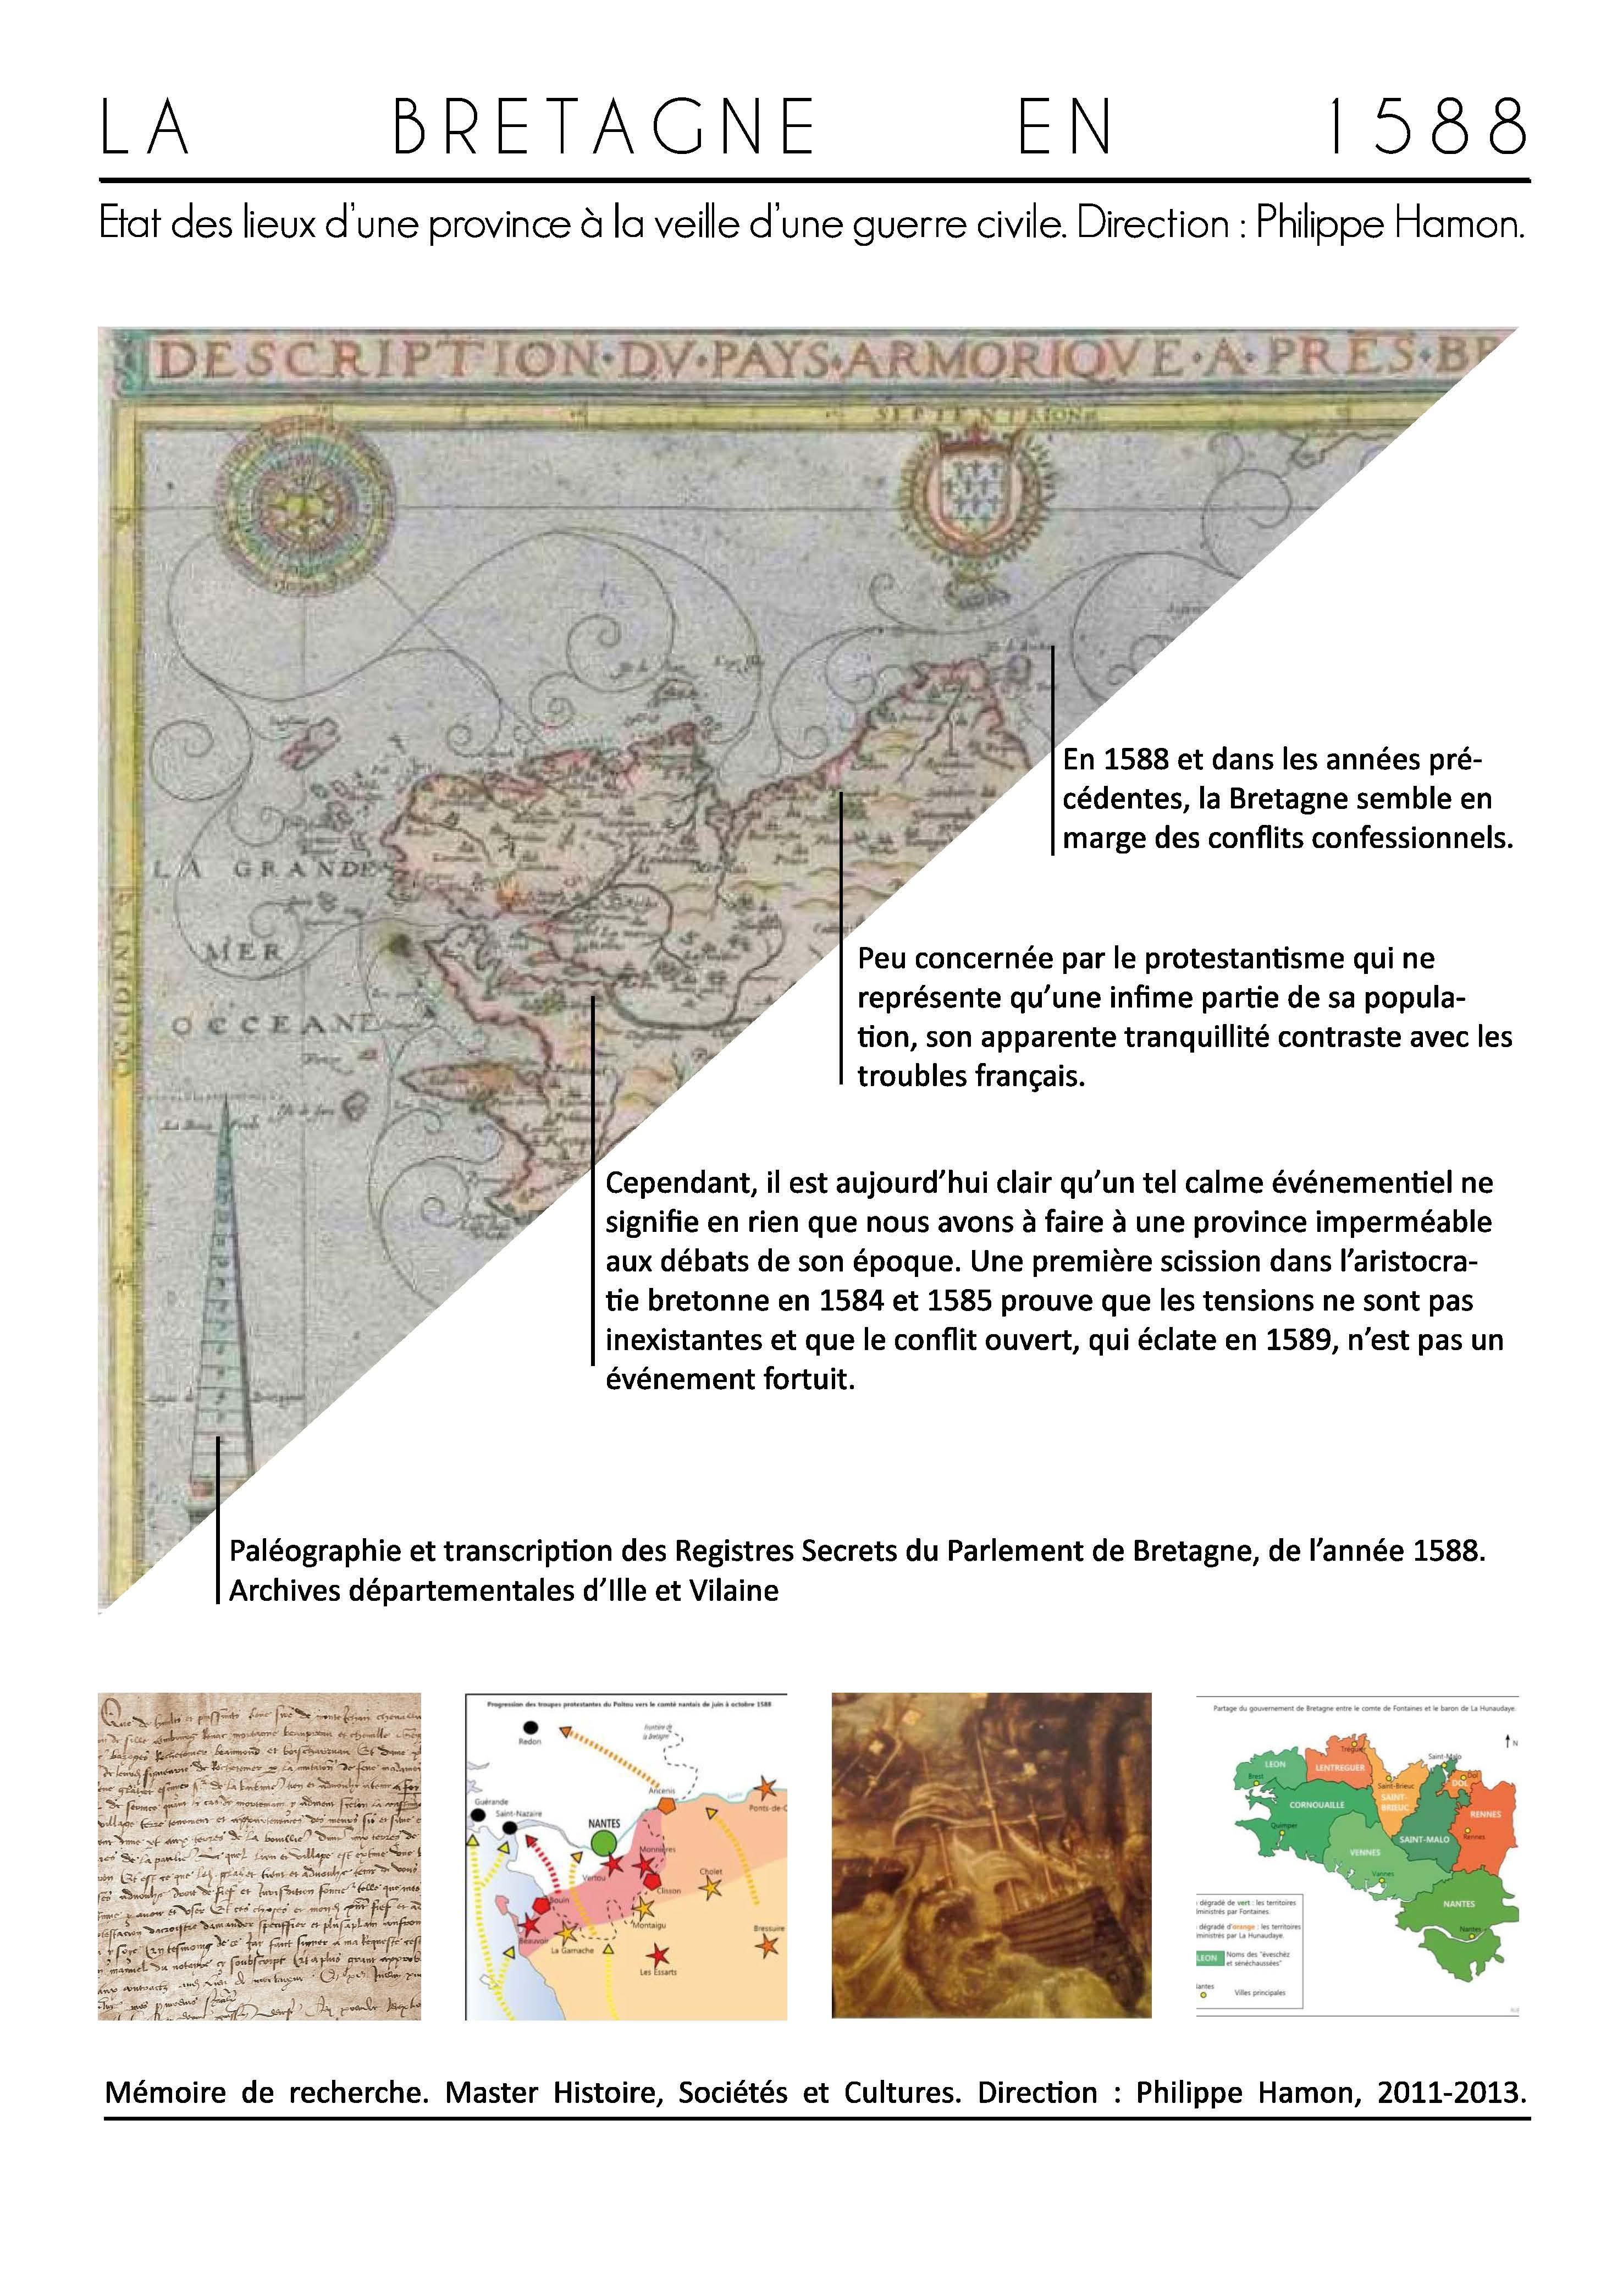 histoire bretagne anthemion recherche historien patrimoine